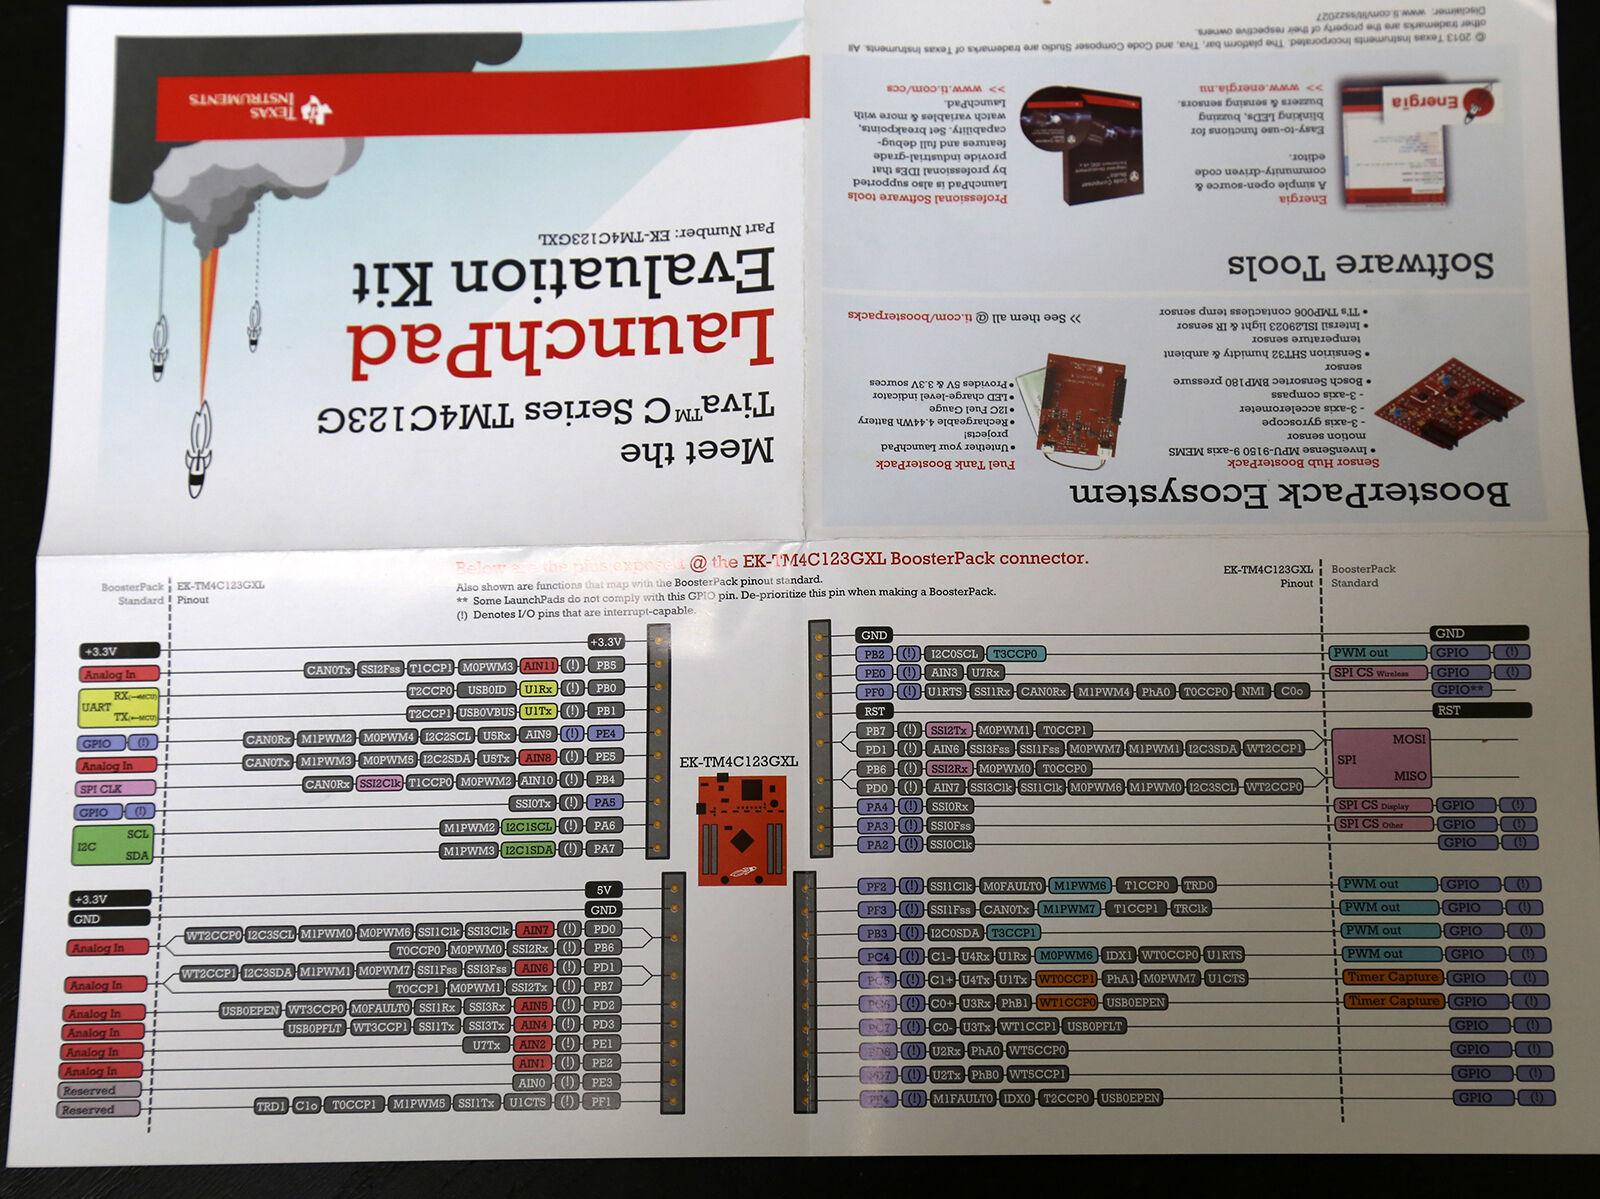 Texas Instruments Ek-tm4c123gxl Tm4c123g Launchpad Tiva C Eval Kit